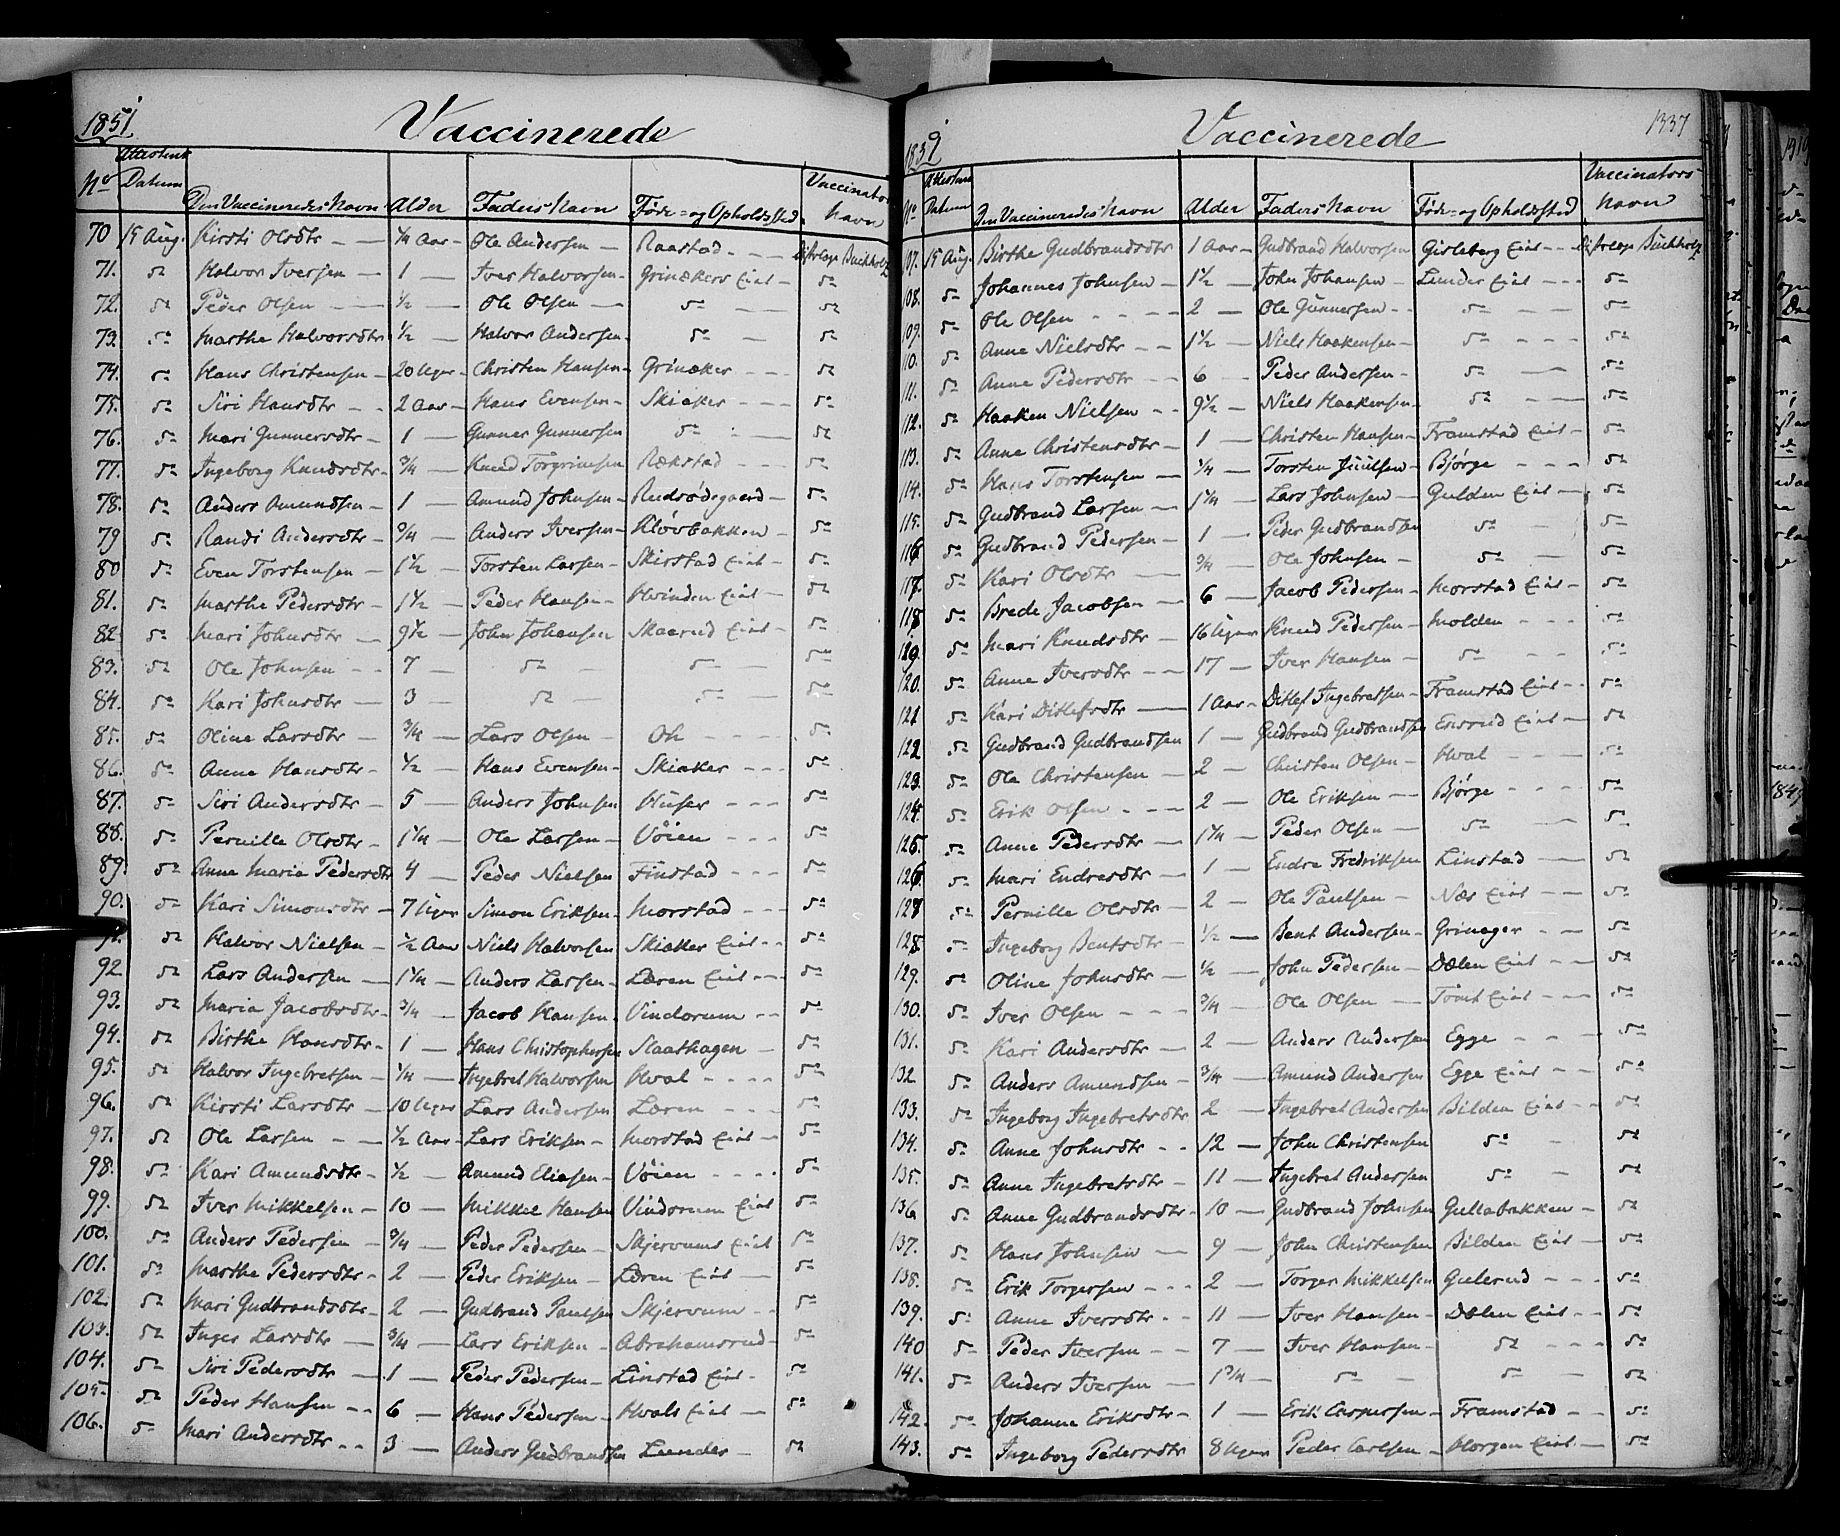 SAH, Gran prestekontor, Ministerialbok nr. 11, 1842-1856, s. 1336-1337